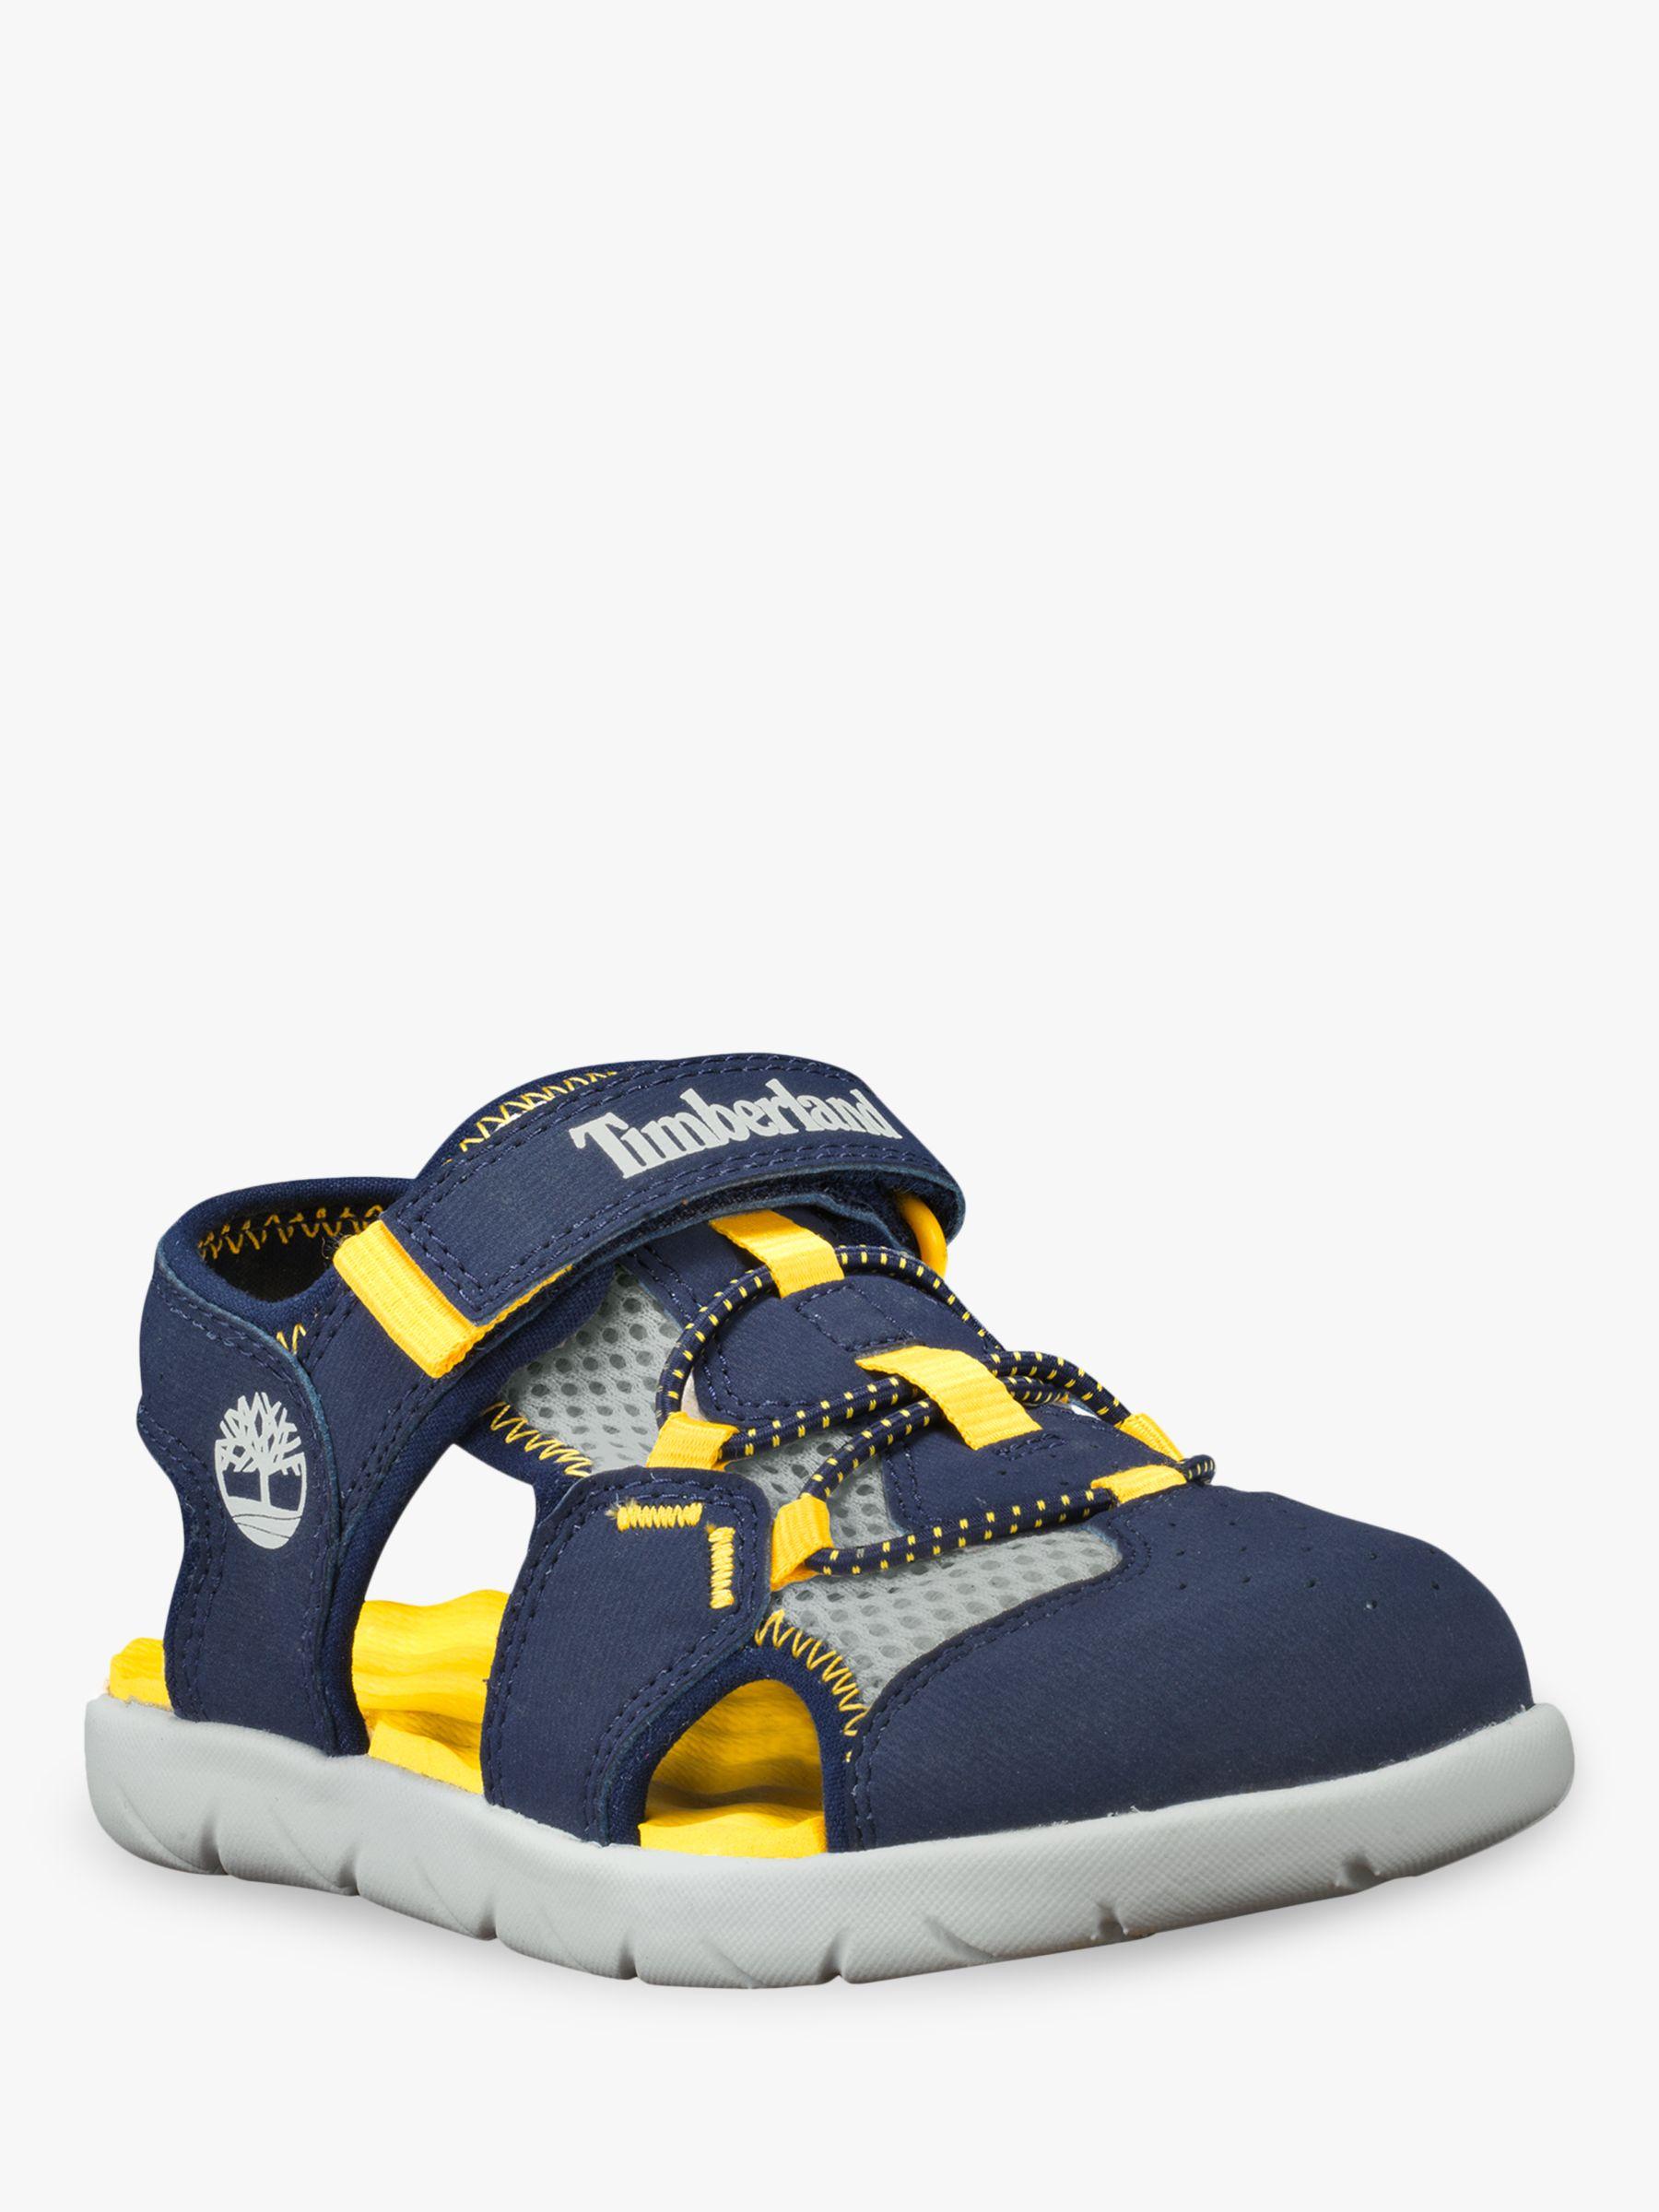 moda de lujo bonito diseño comprar mejor Timberland Children's Perkins Row Fisherman Sandals, Navy/Yellow ...